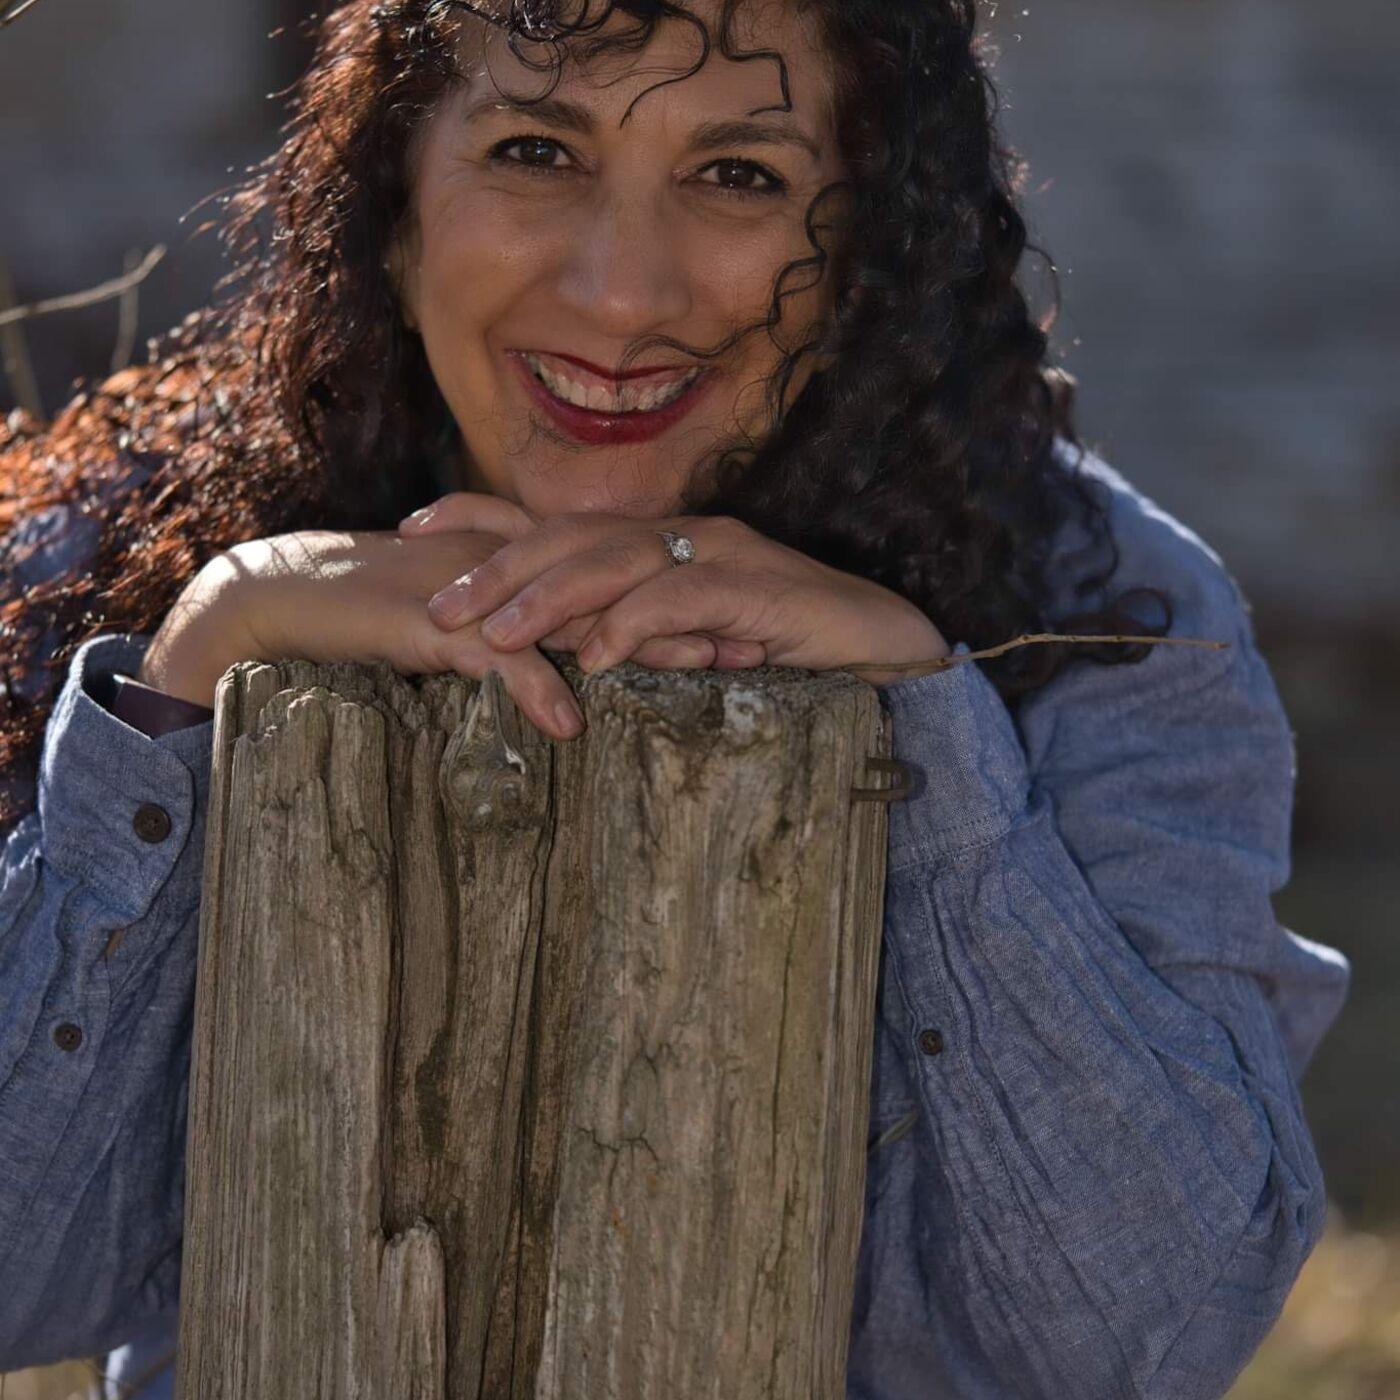 A Conscious Conversation With Carissa Pankey